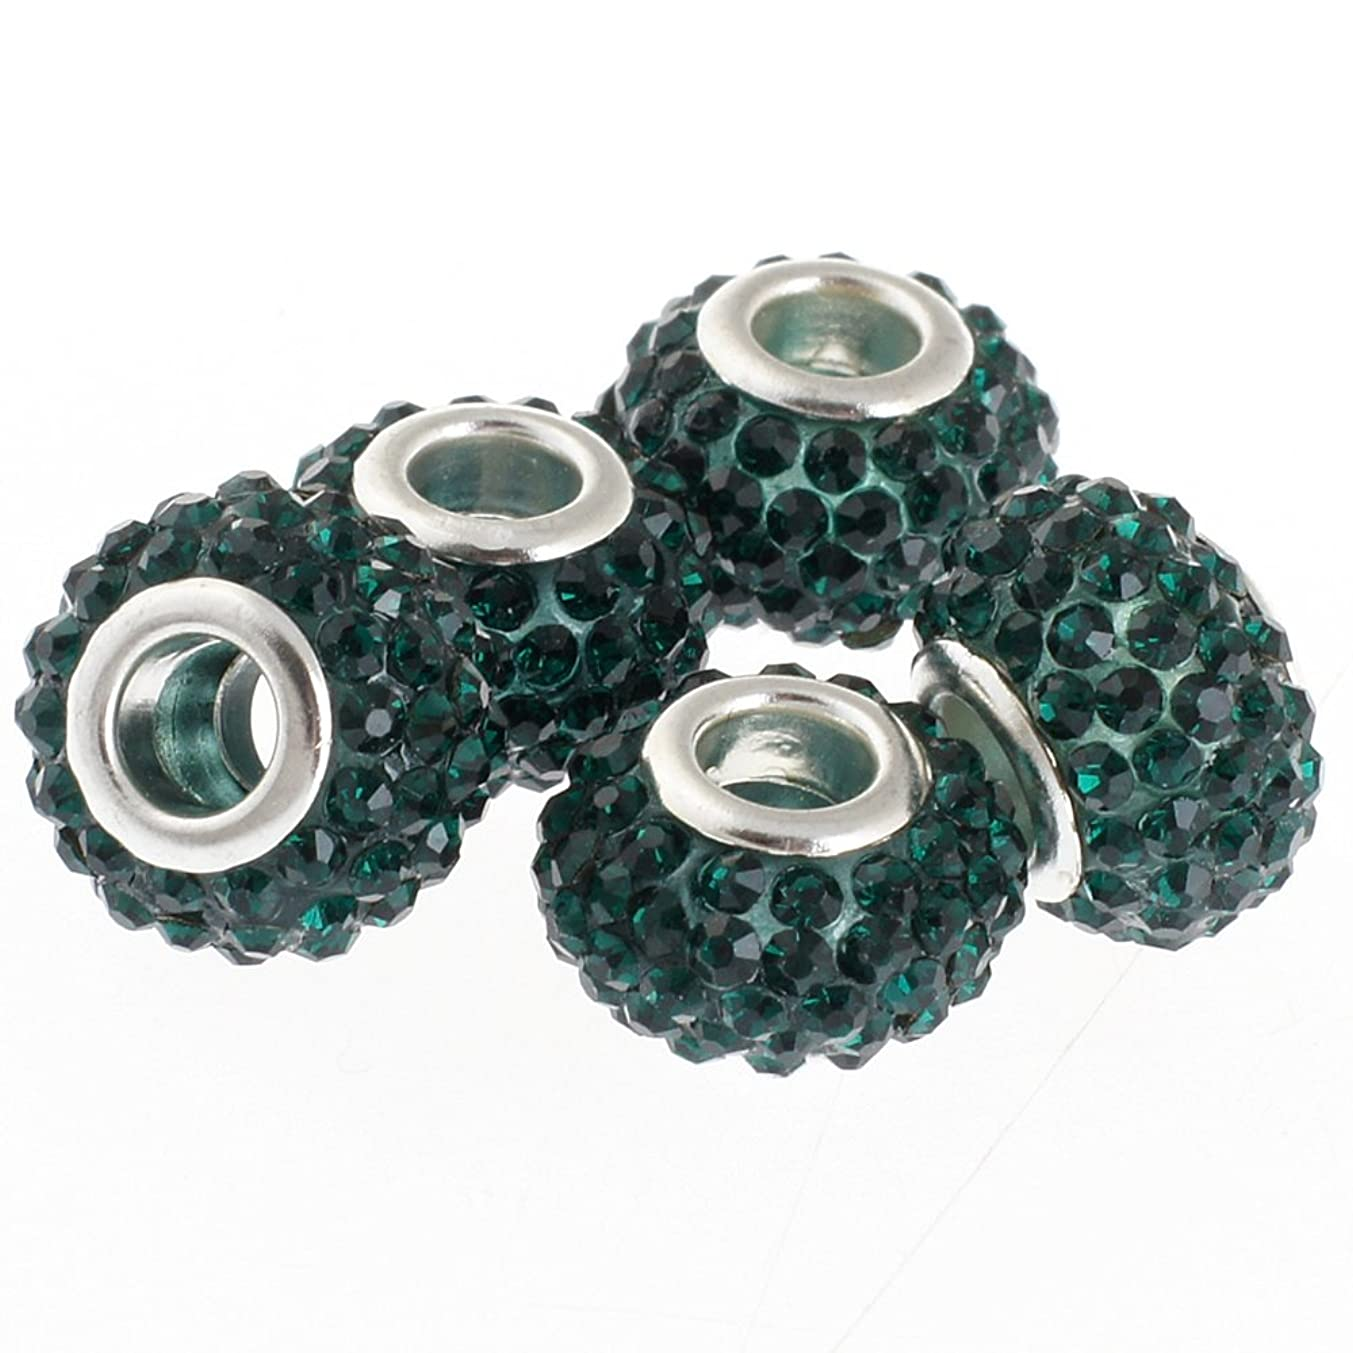 RUBYCA Big Hole Handmade Czech Crystal Slide Beads fit European Charm Bracelet (10pcs, Green, 11mm)